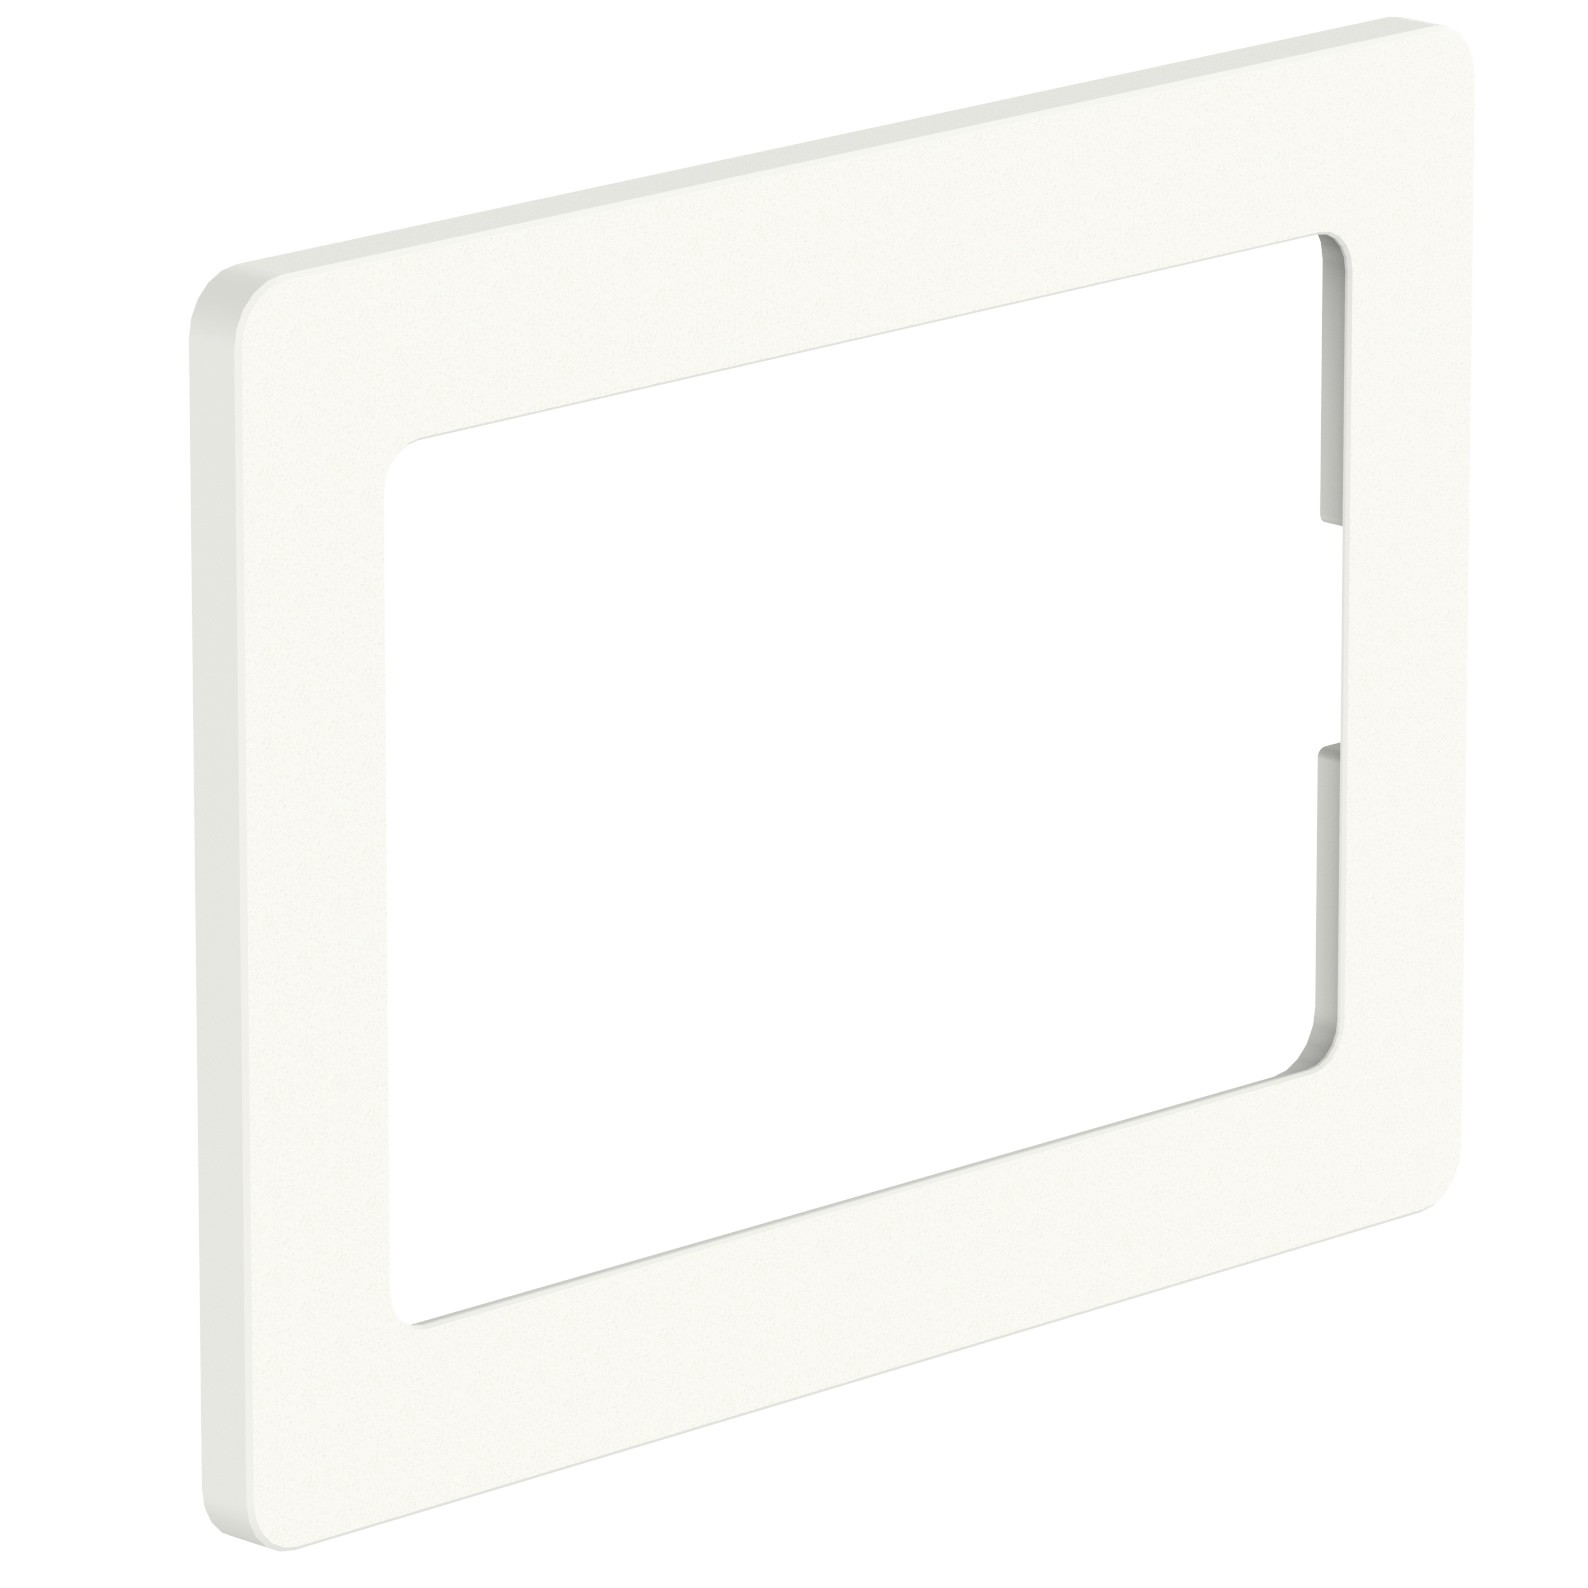 VidaMount VESA Tablet Enclosure - iPad Mini 4 - White